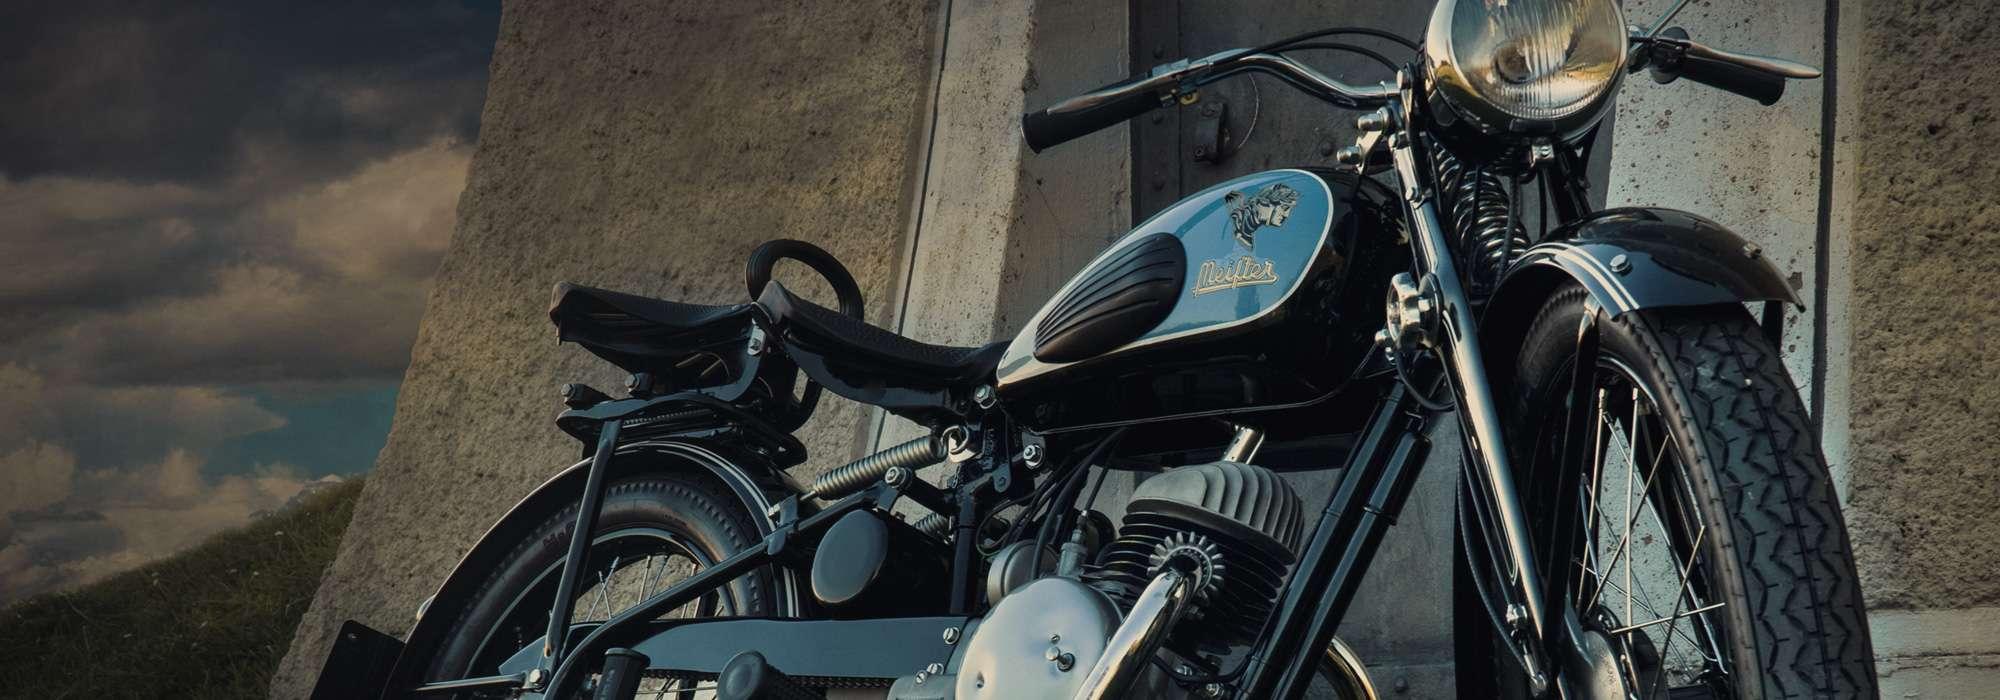 Reimo Motobike  D-78345 Moos Bankholzen